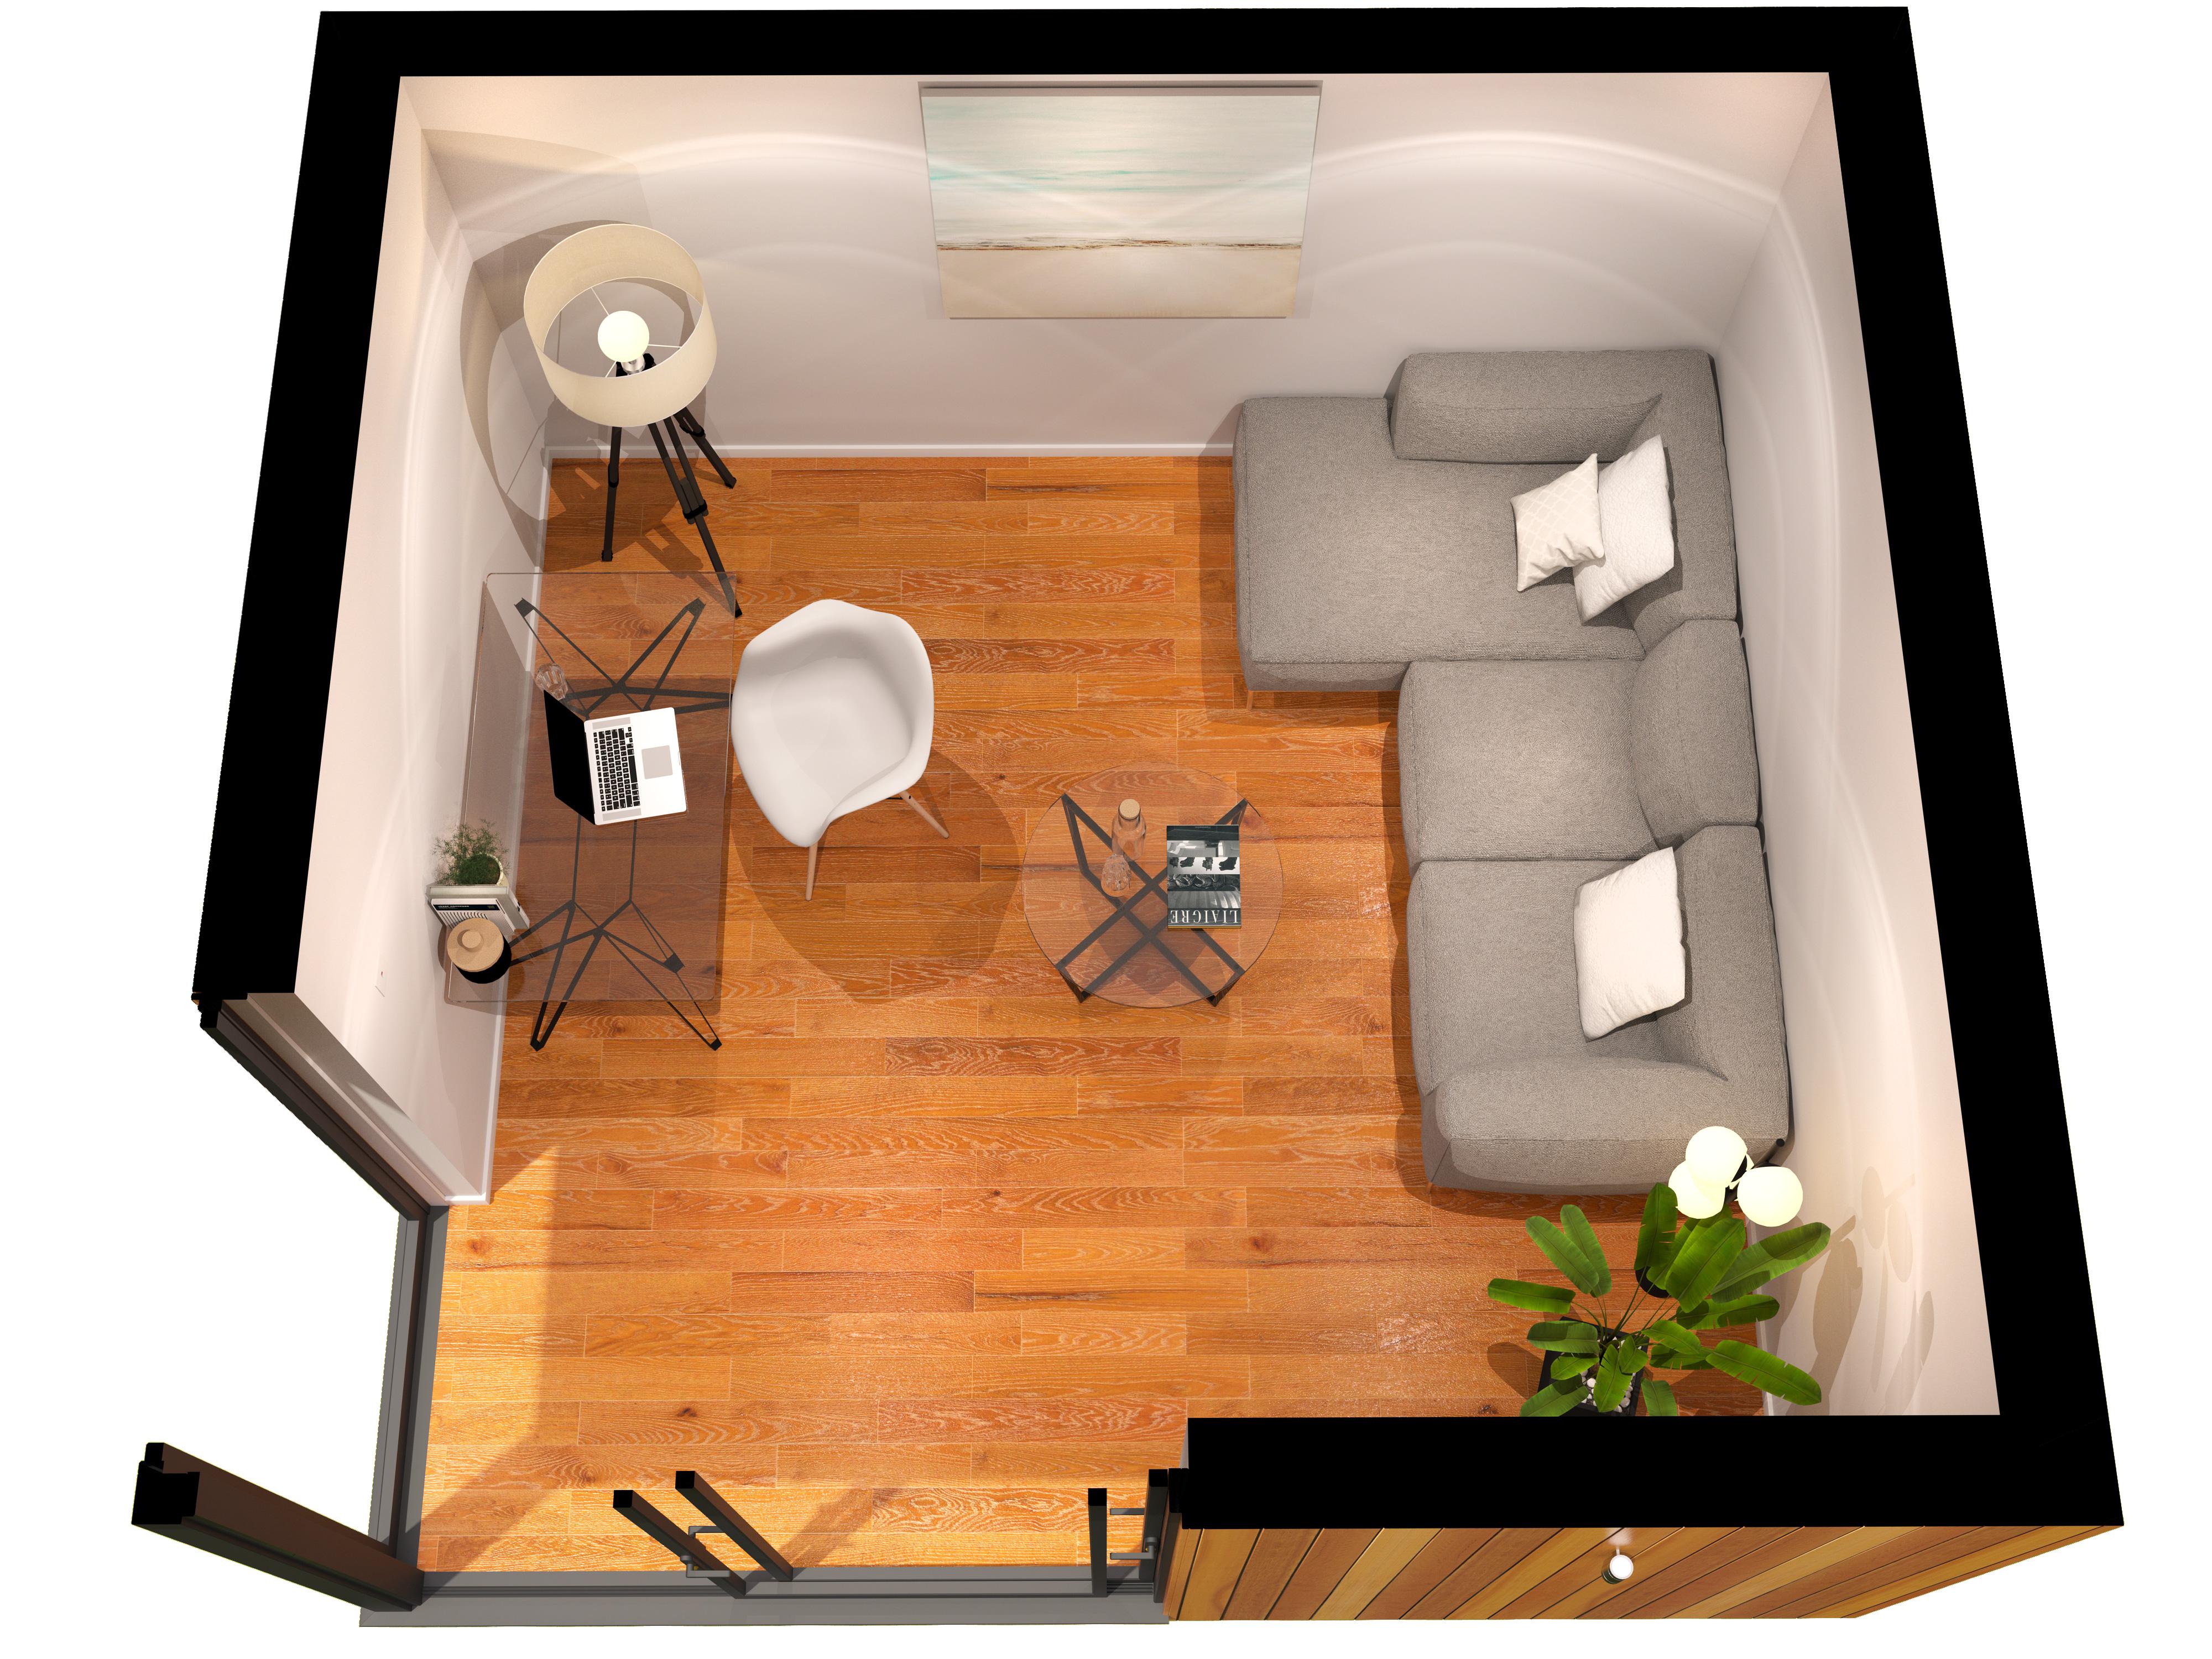 Garden room and garden office layout